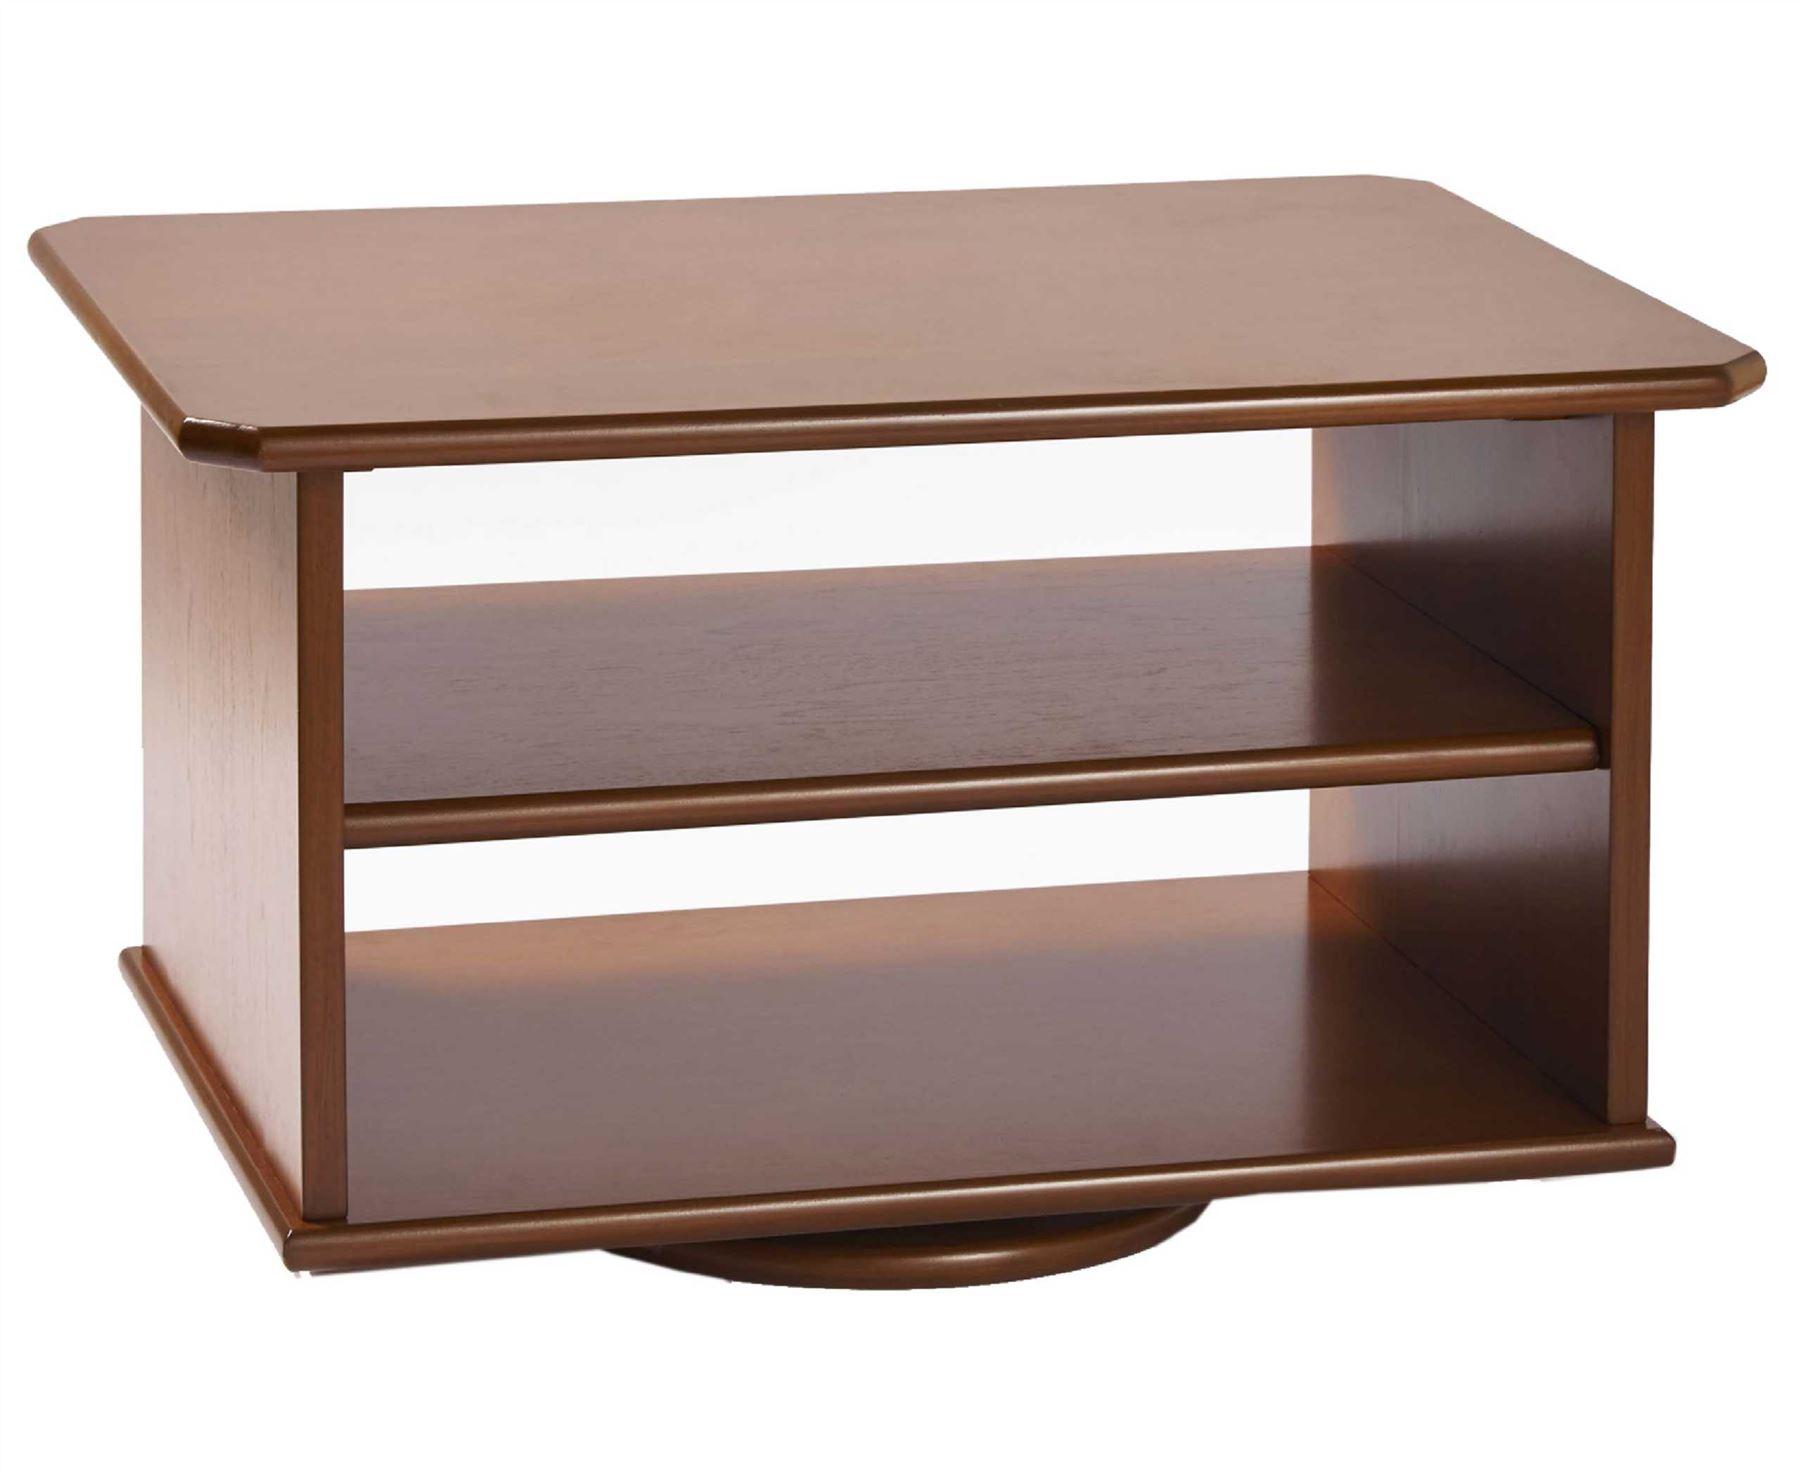 Tv Swivel Stand 2 Tier Furniture Media Storage Shelving